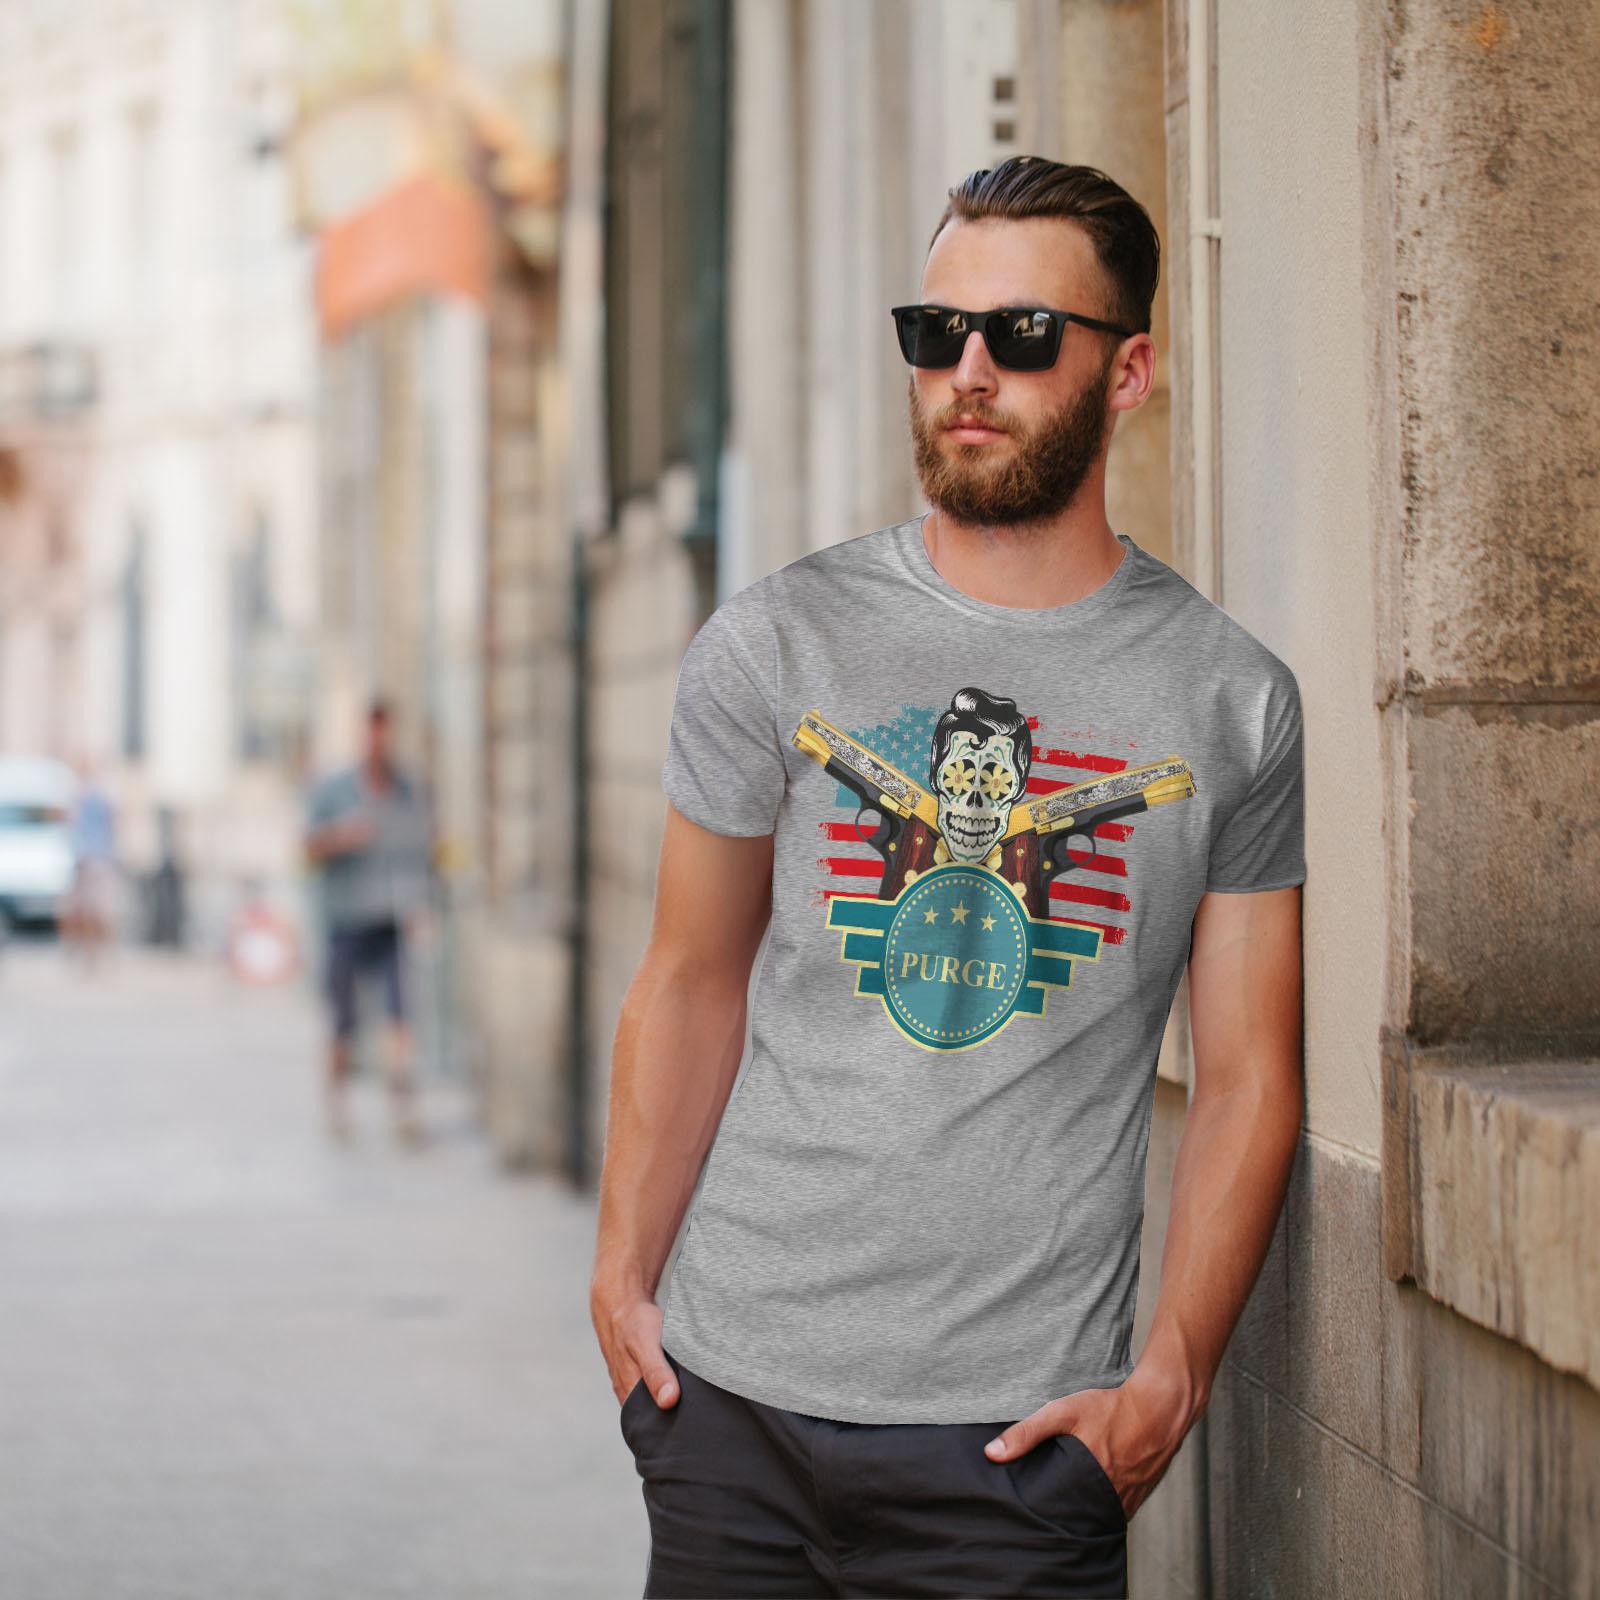 American Graphic Design Printed Tee Wellcoda USA Gun Purge Rock Mens T-shirt